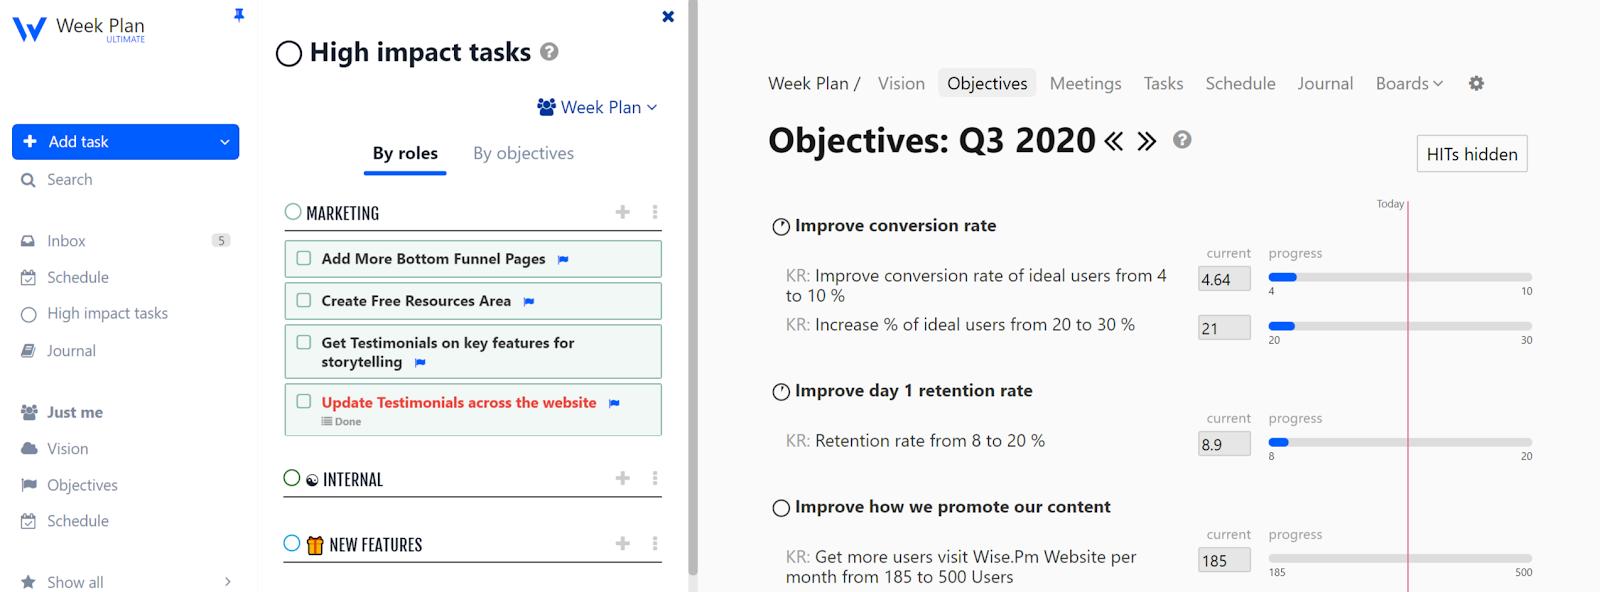 Work-Planner-High-Impact-Tasks